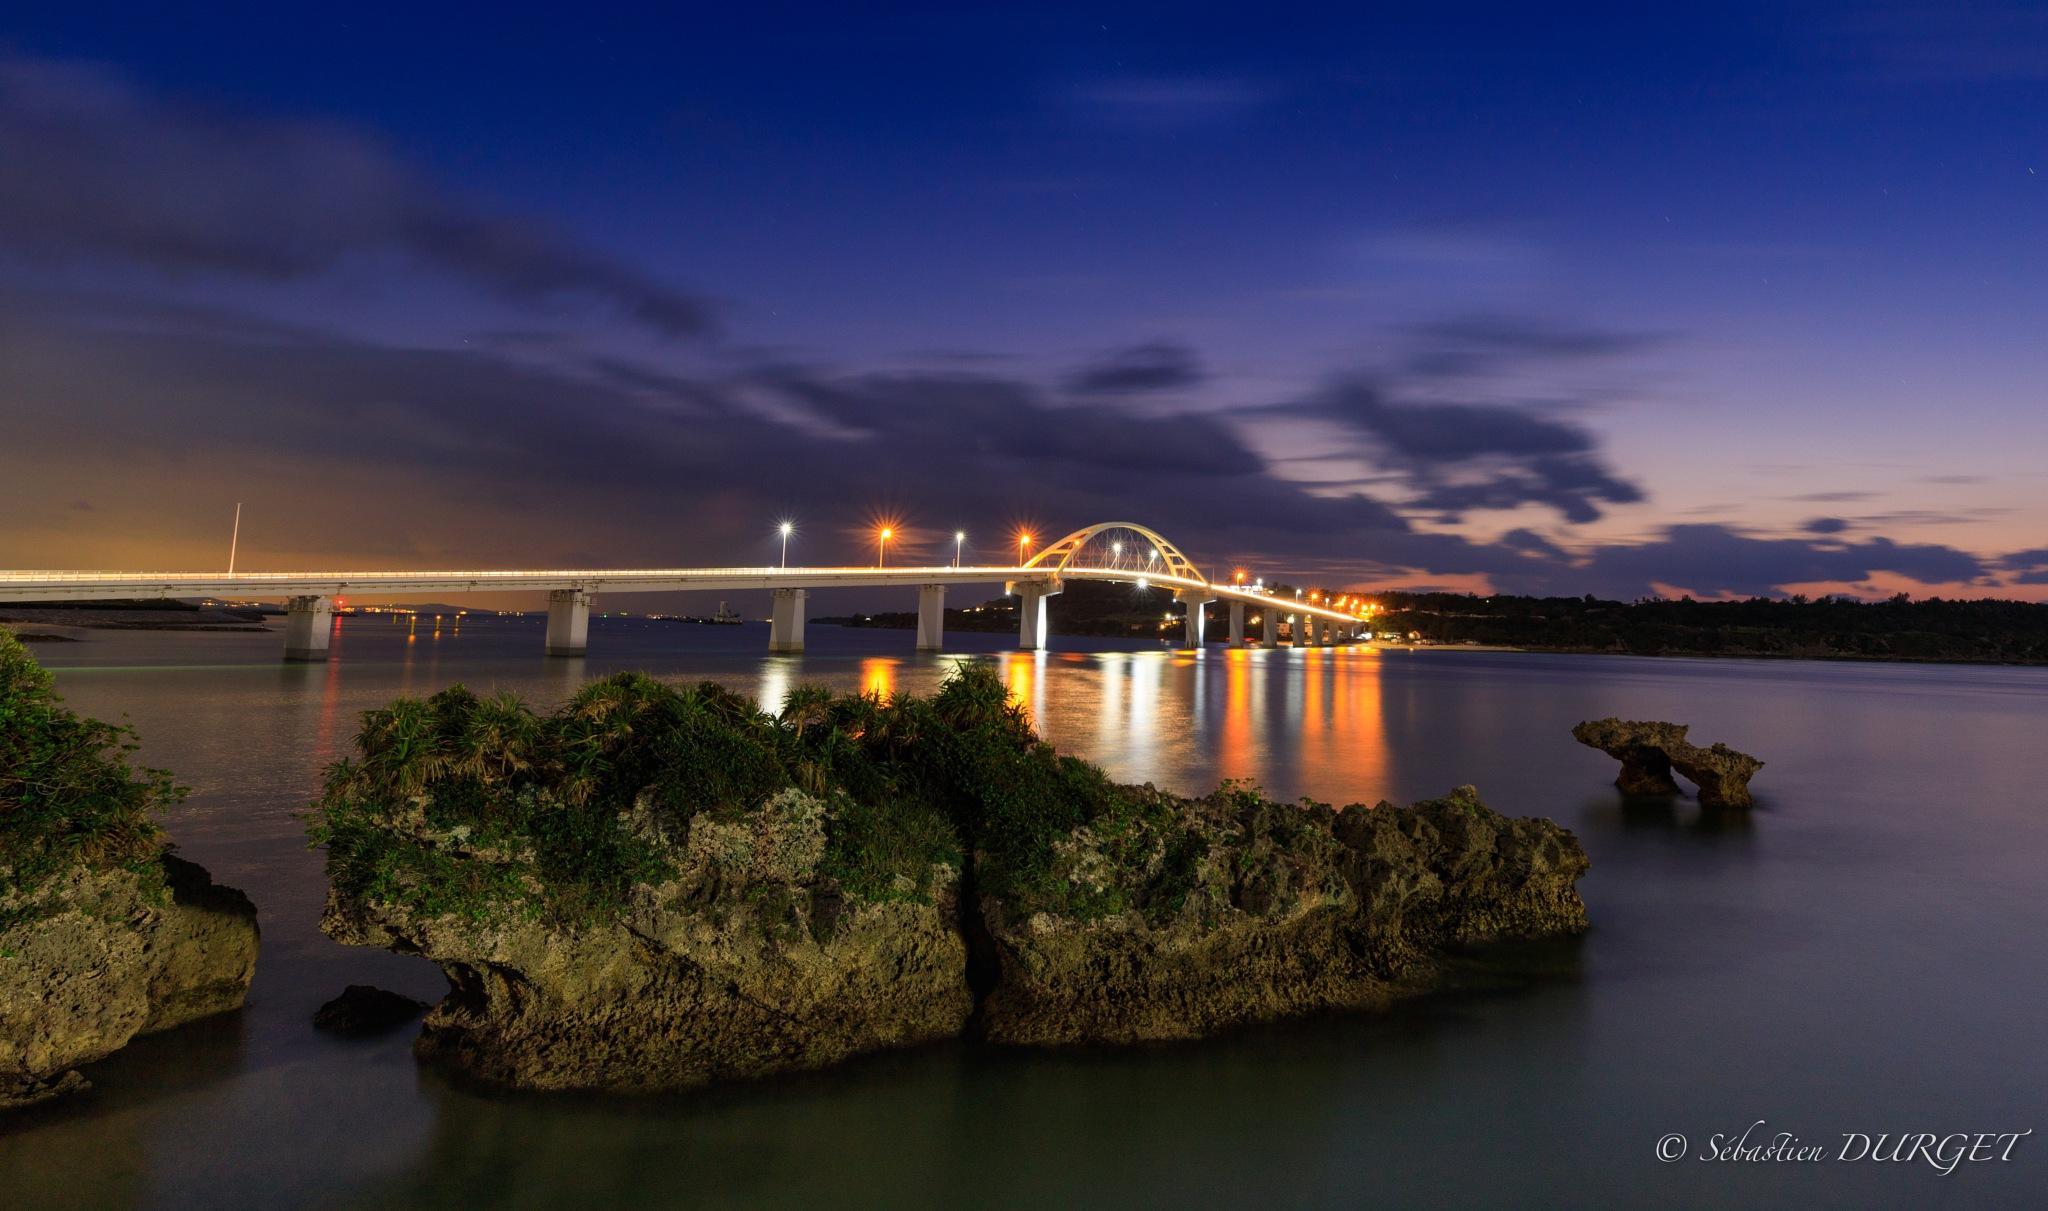 Blue hour on Bridge Okinawa by Sébastien